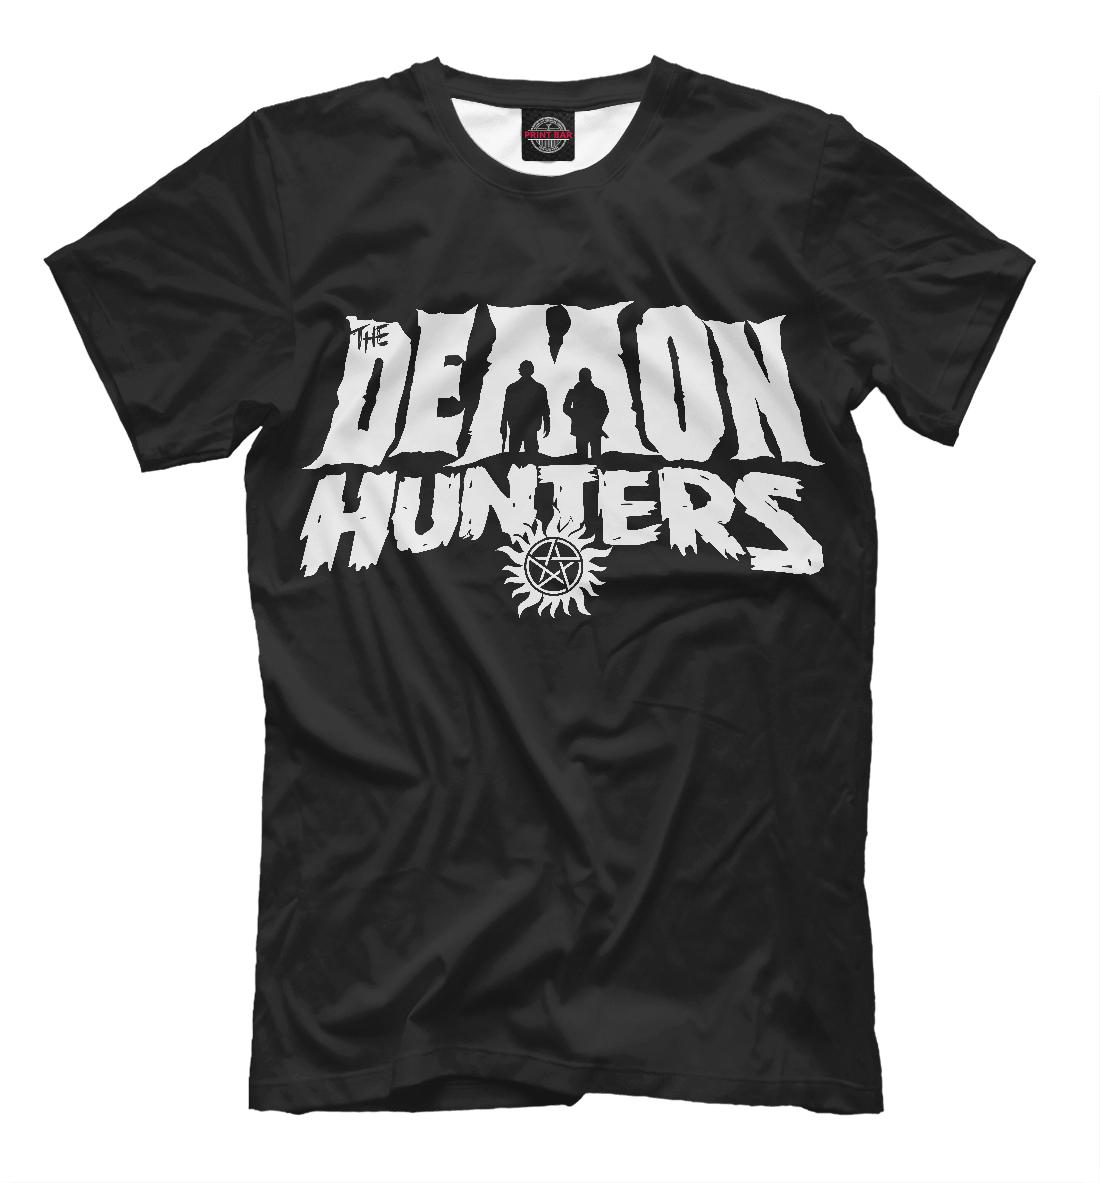 Купить Demon Hunters, Printbar, Футболки, SVE-108532-fut-2